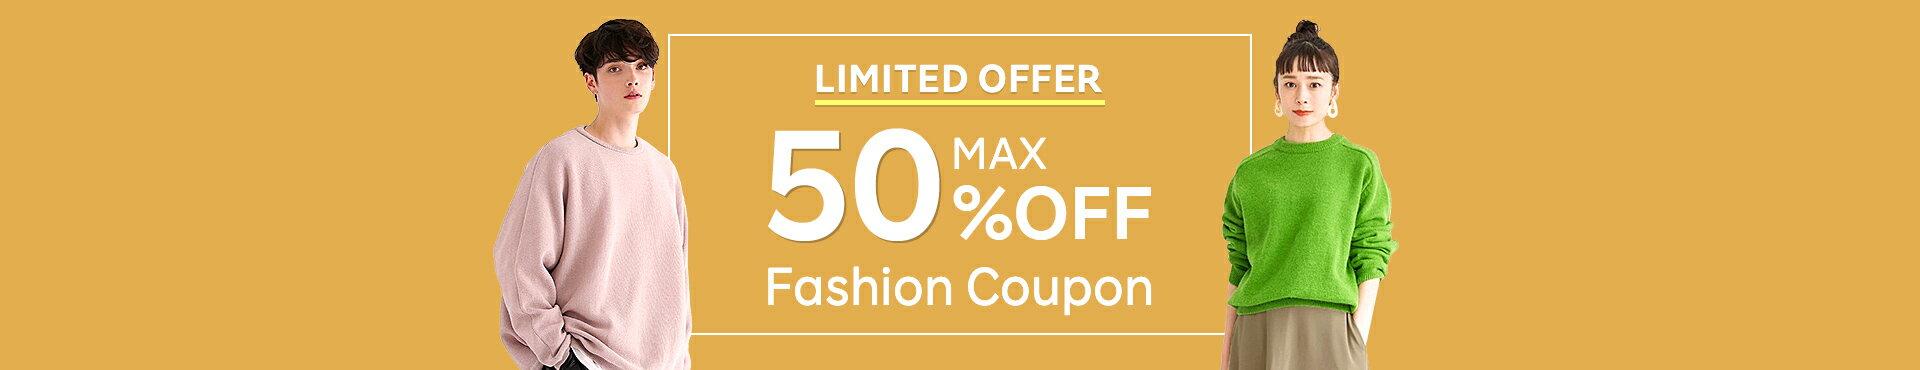 MAX 50% OFF Fashion Coupon